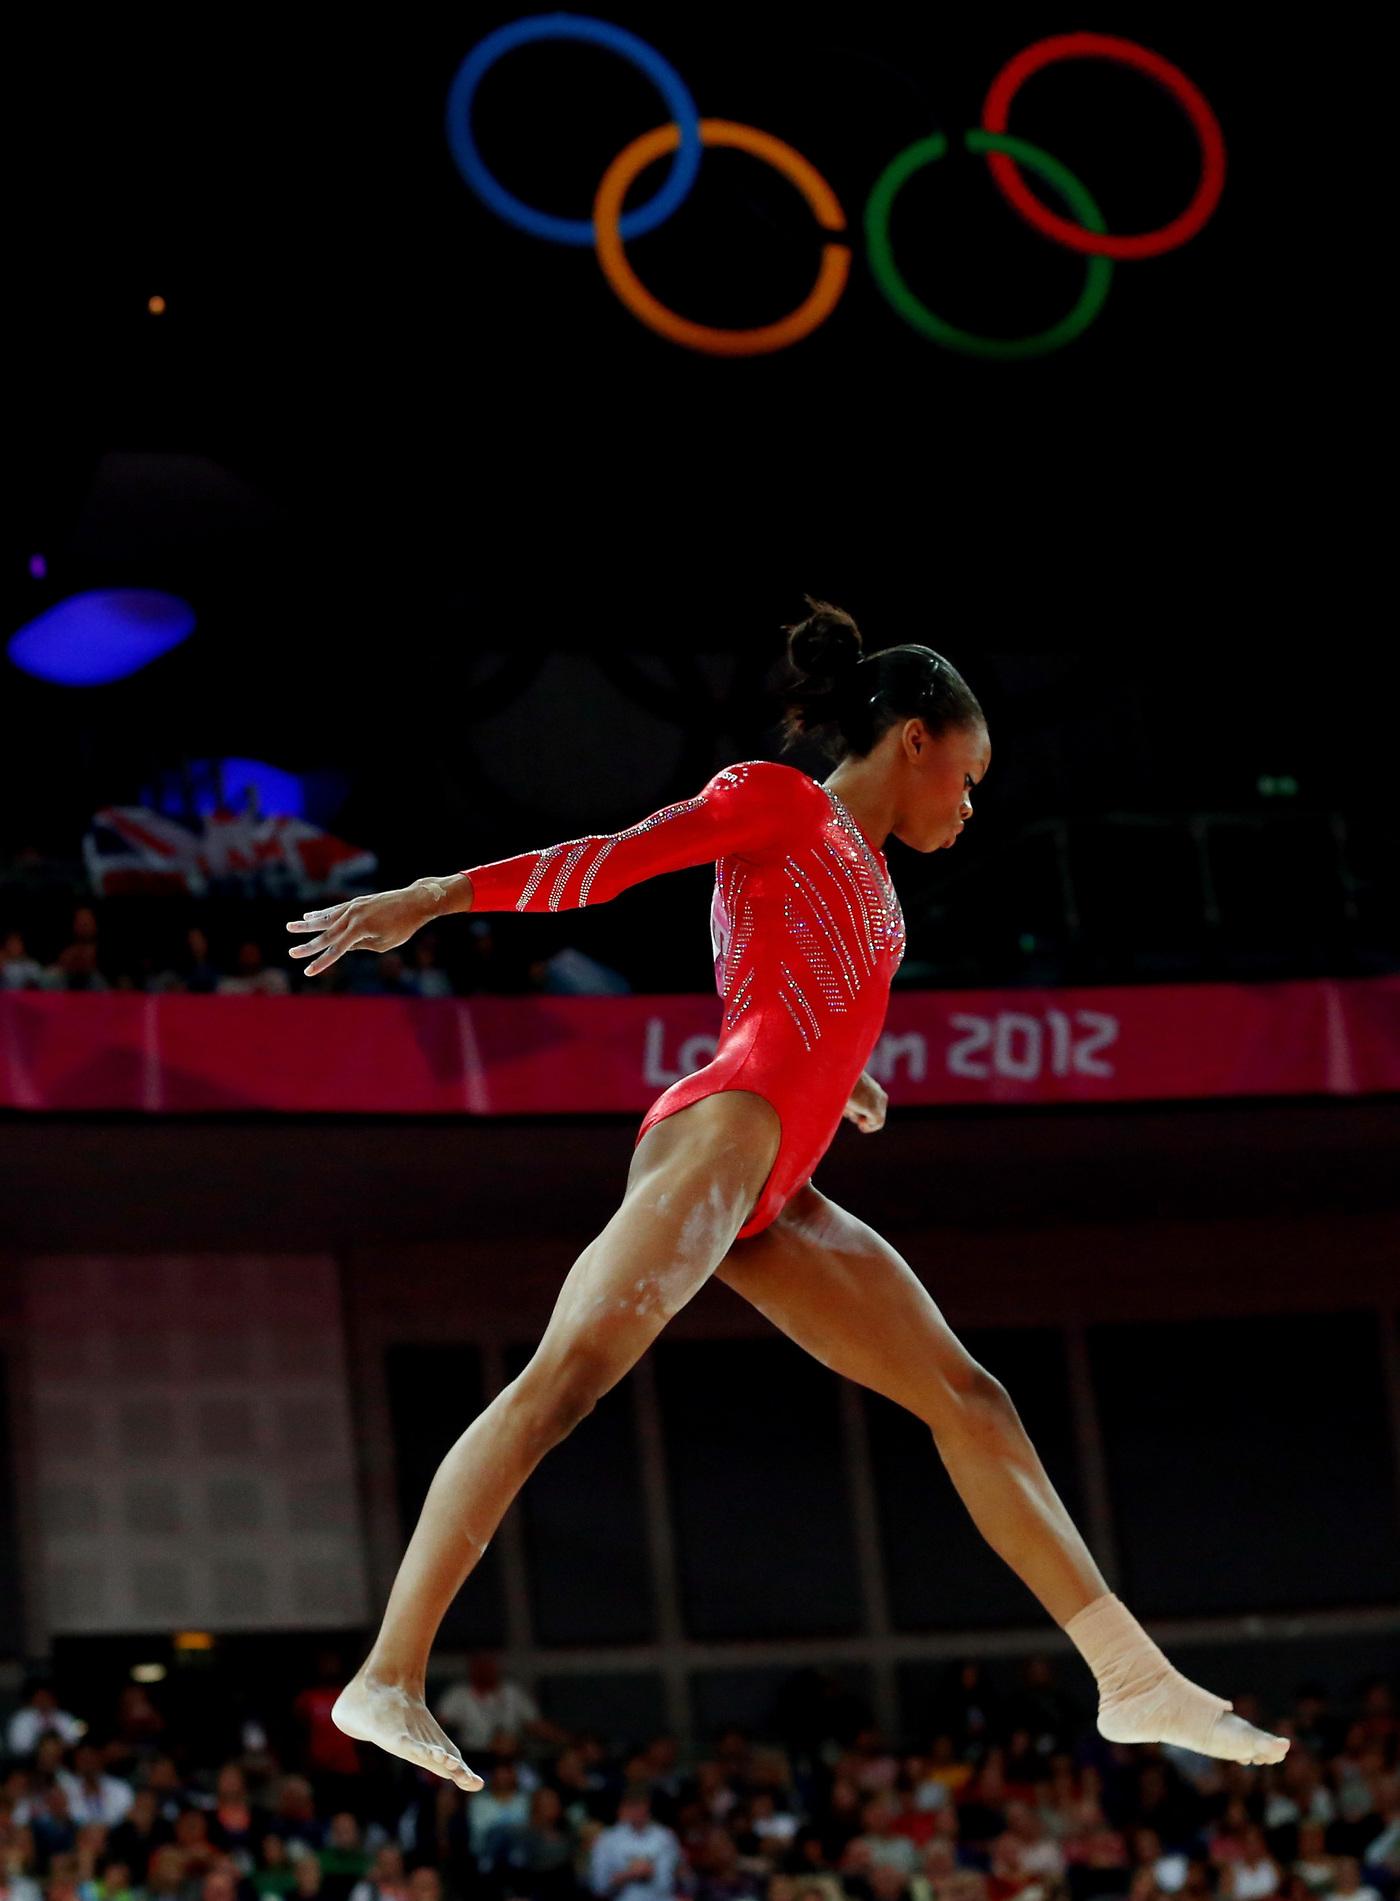 London 2012: U.S. Women's Gymnastics Team Wins Gold Medal ...